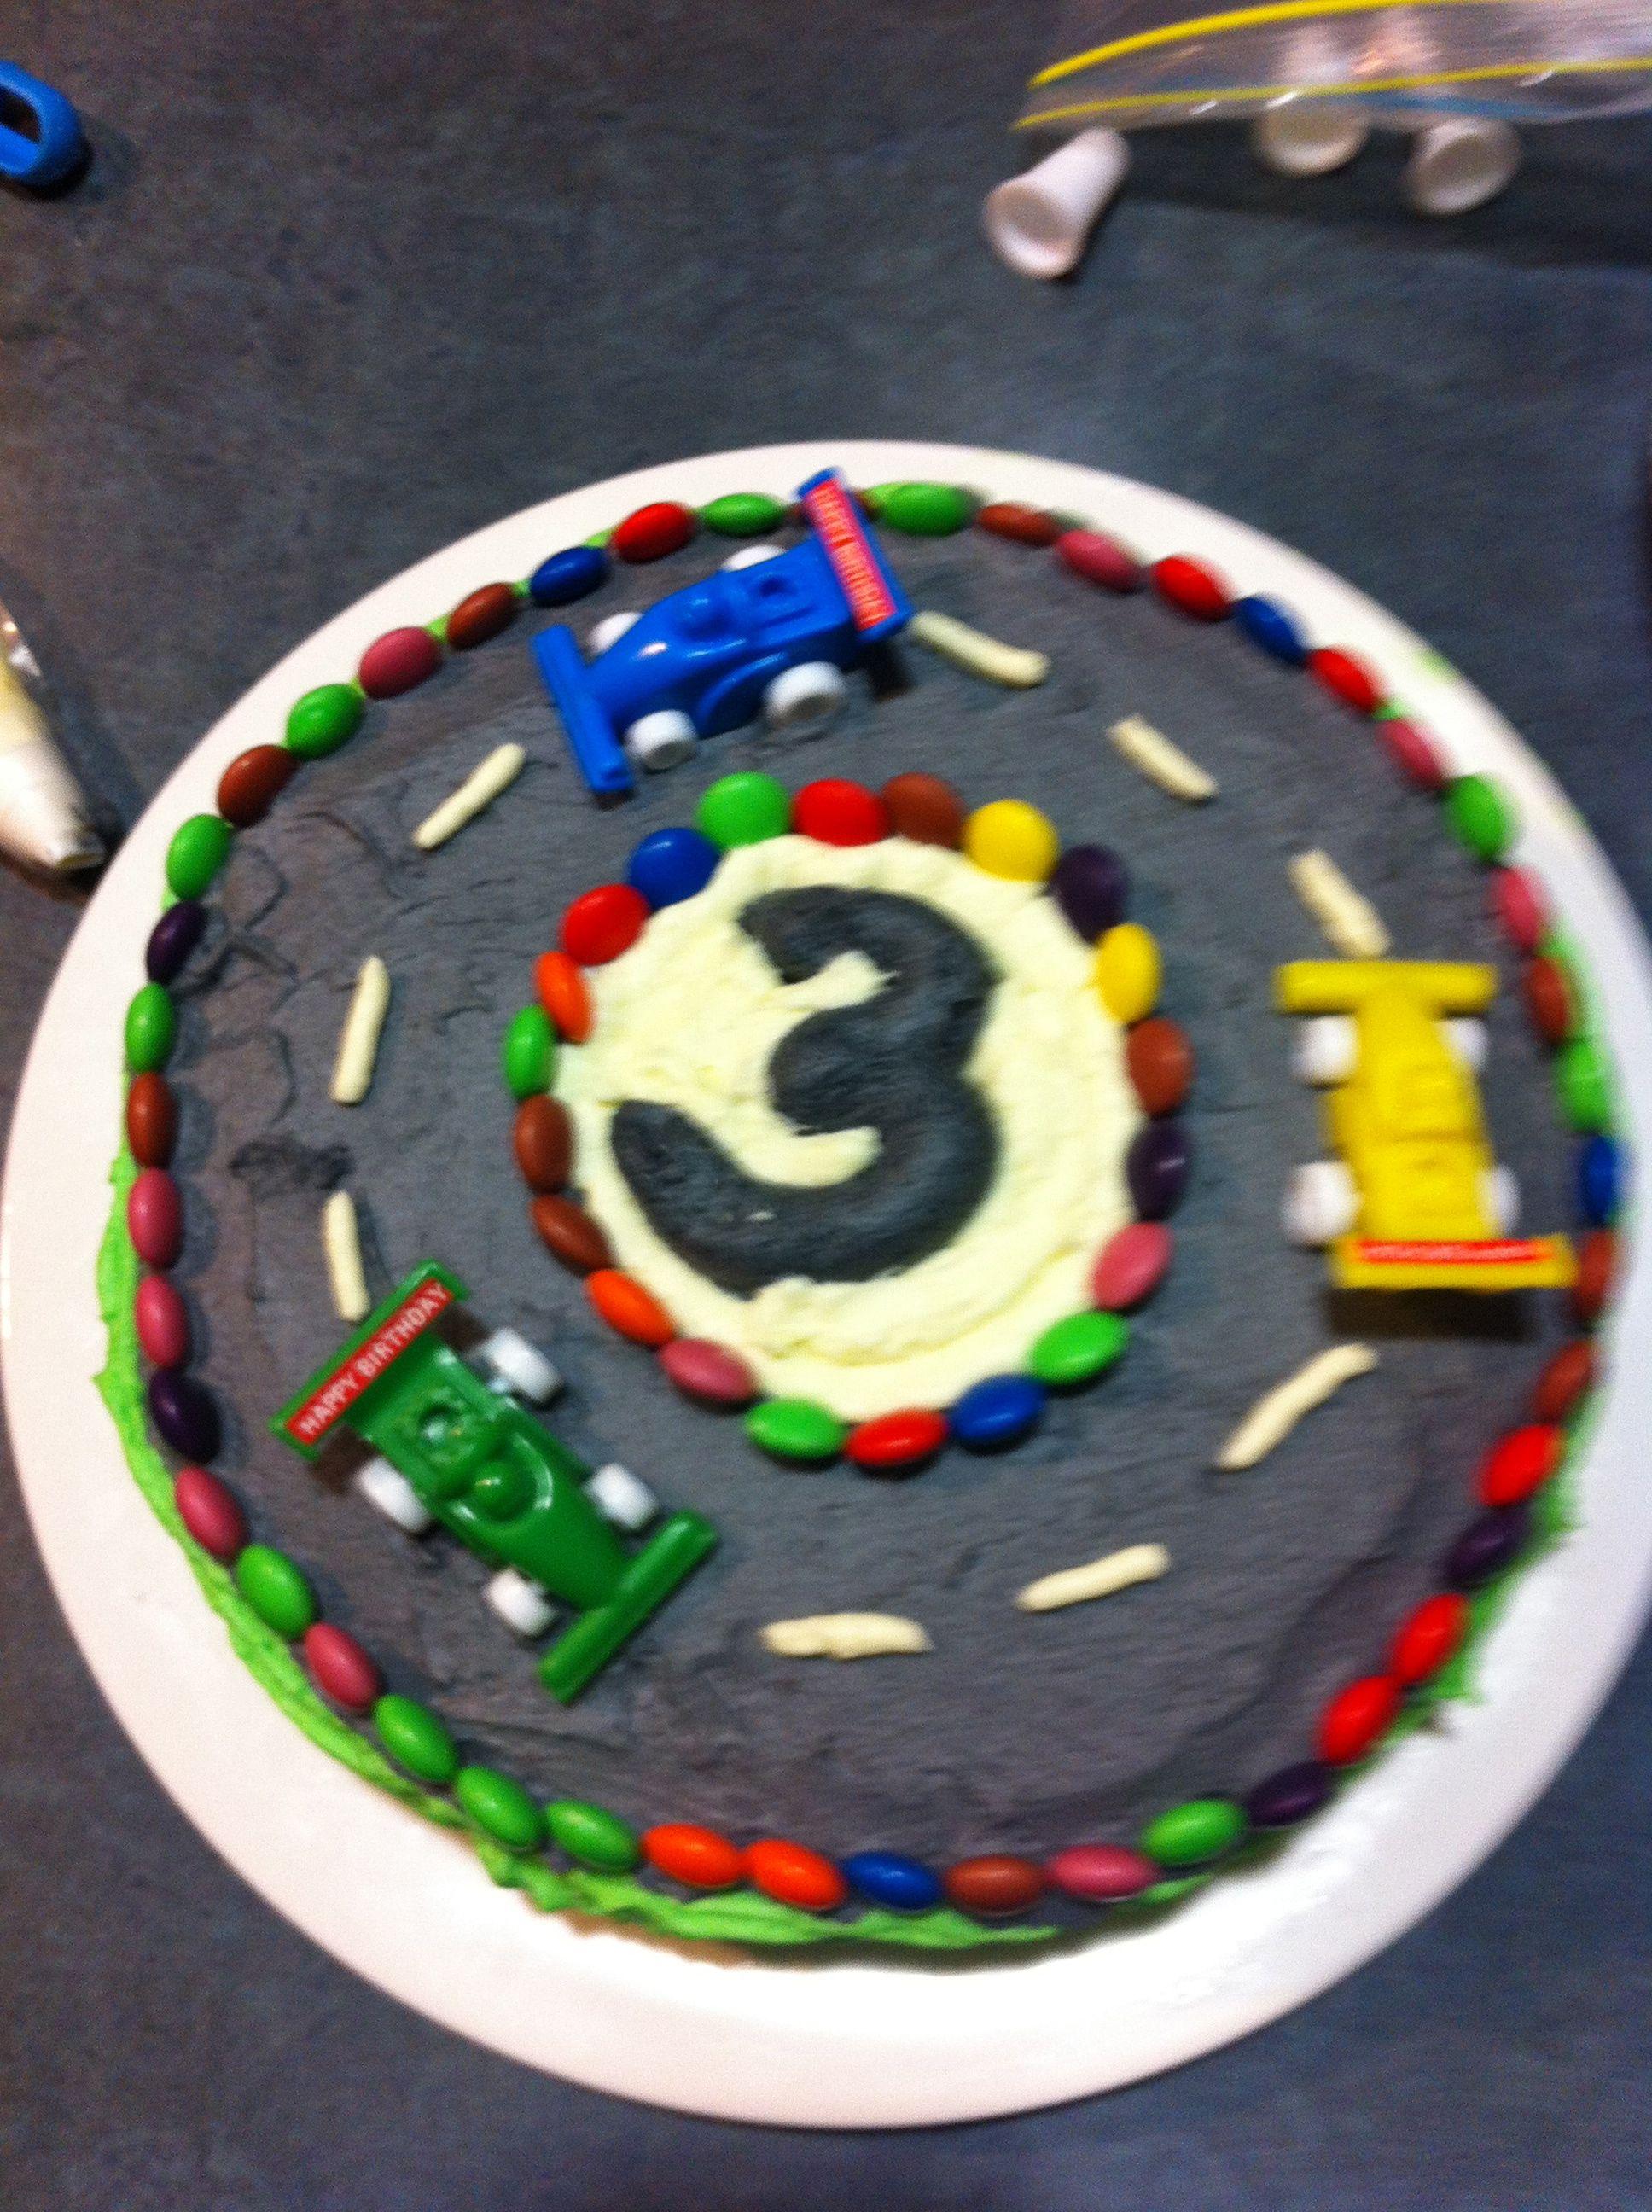 Cake Decorating Car Race Track : Racing car track cake Birthday Party Ideas Pinterest